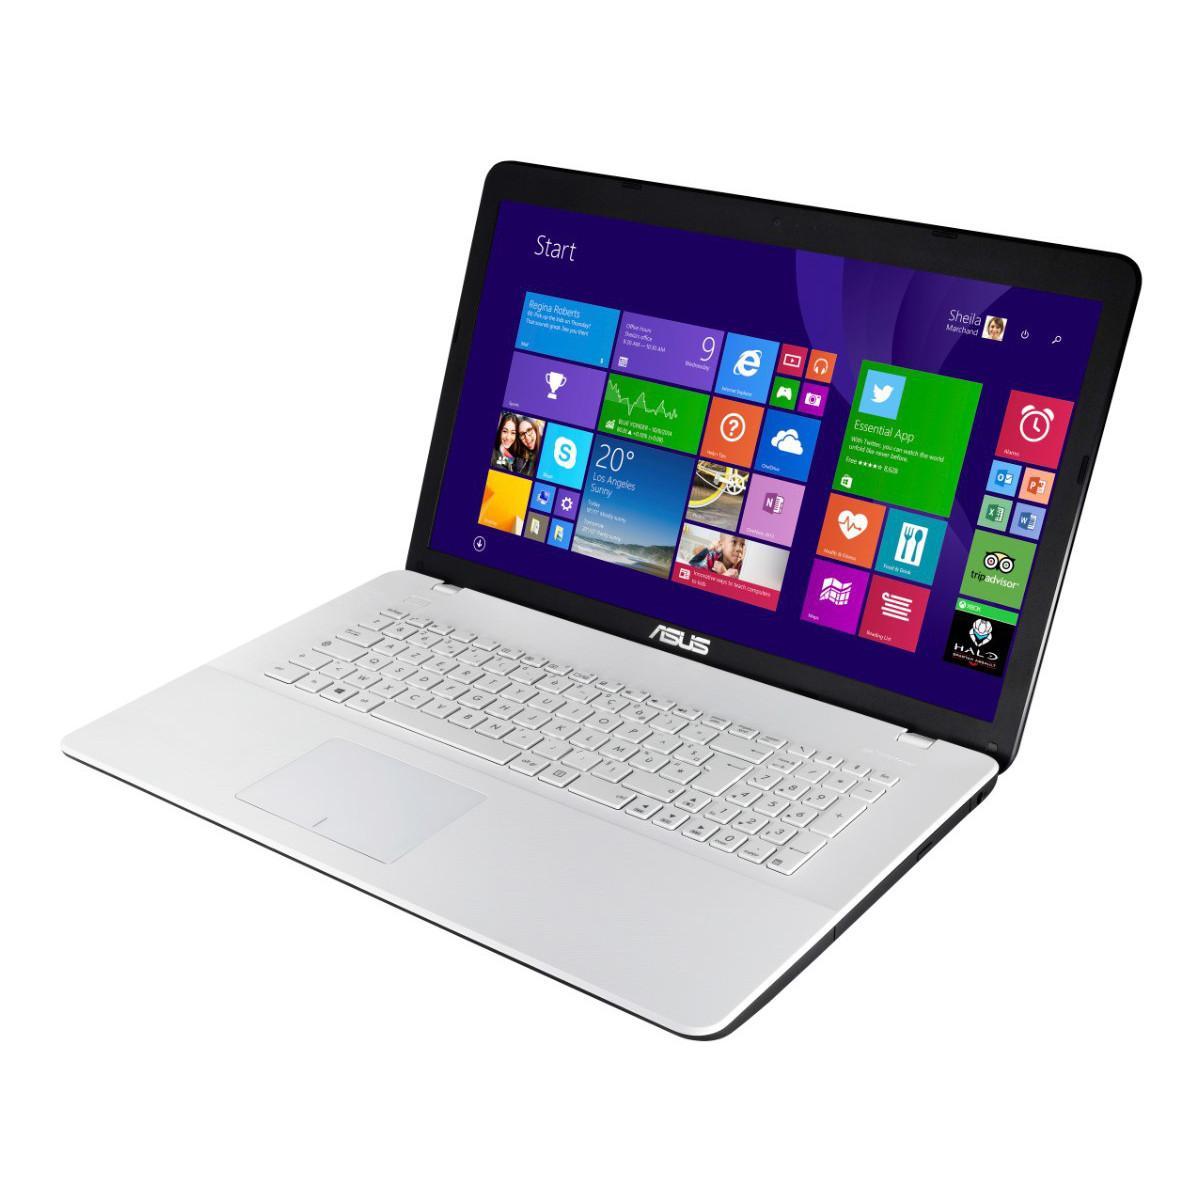 "PC portable 17.3"" Asus X751LK-TY180H (i3-4030U, GTX850, 4 Go de RAM, 1 To)"